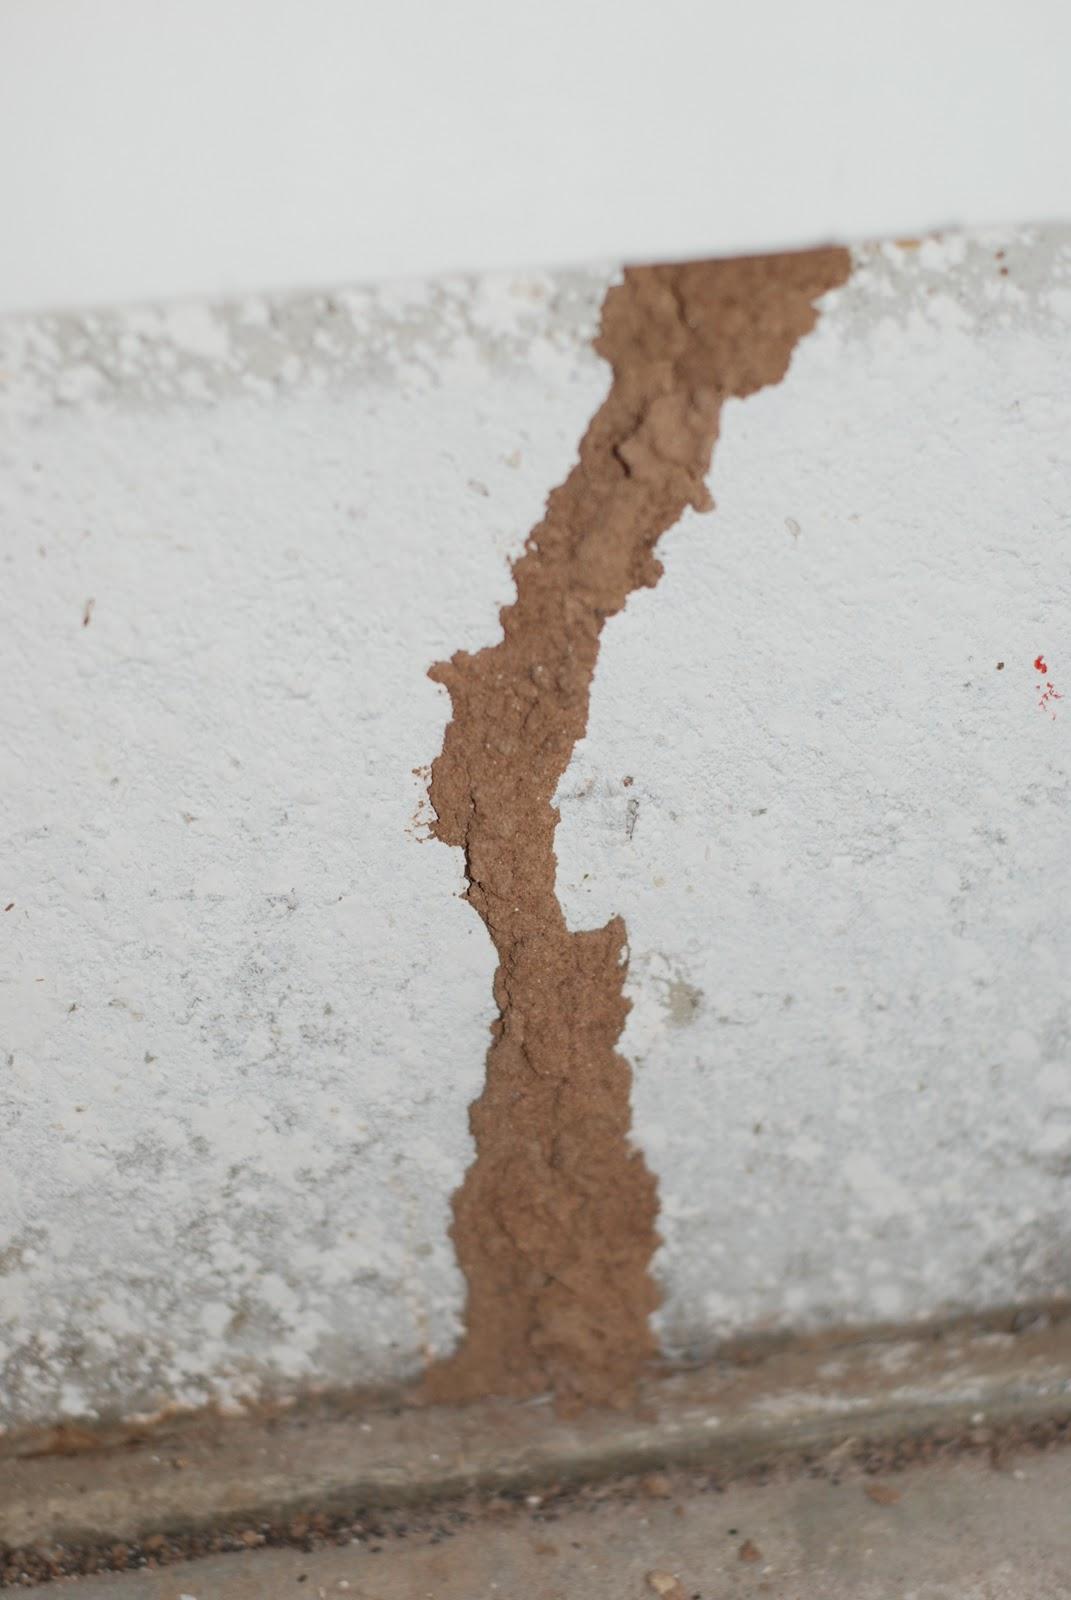 Arizona S Termite Expert